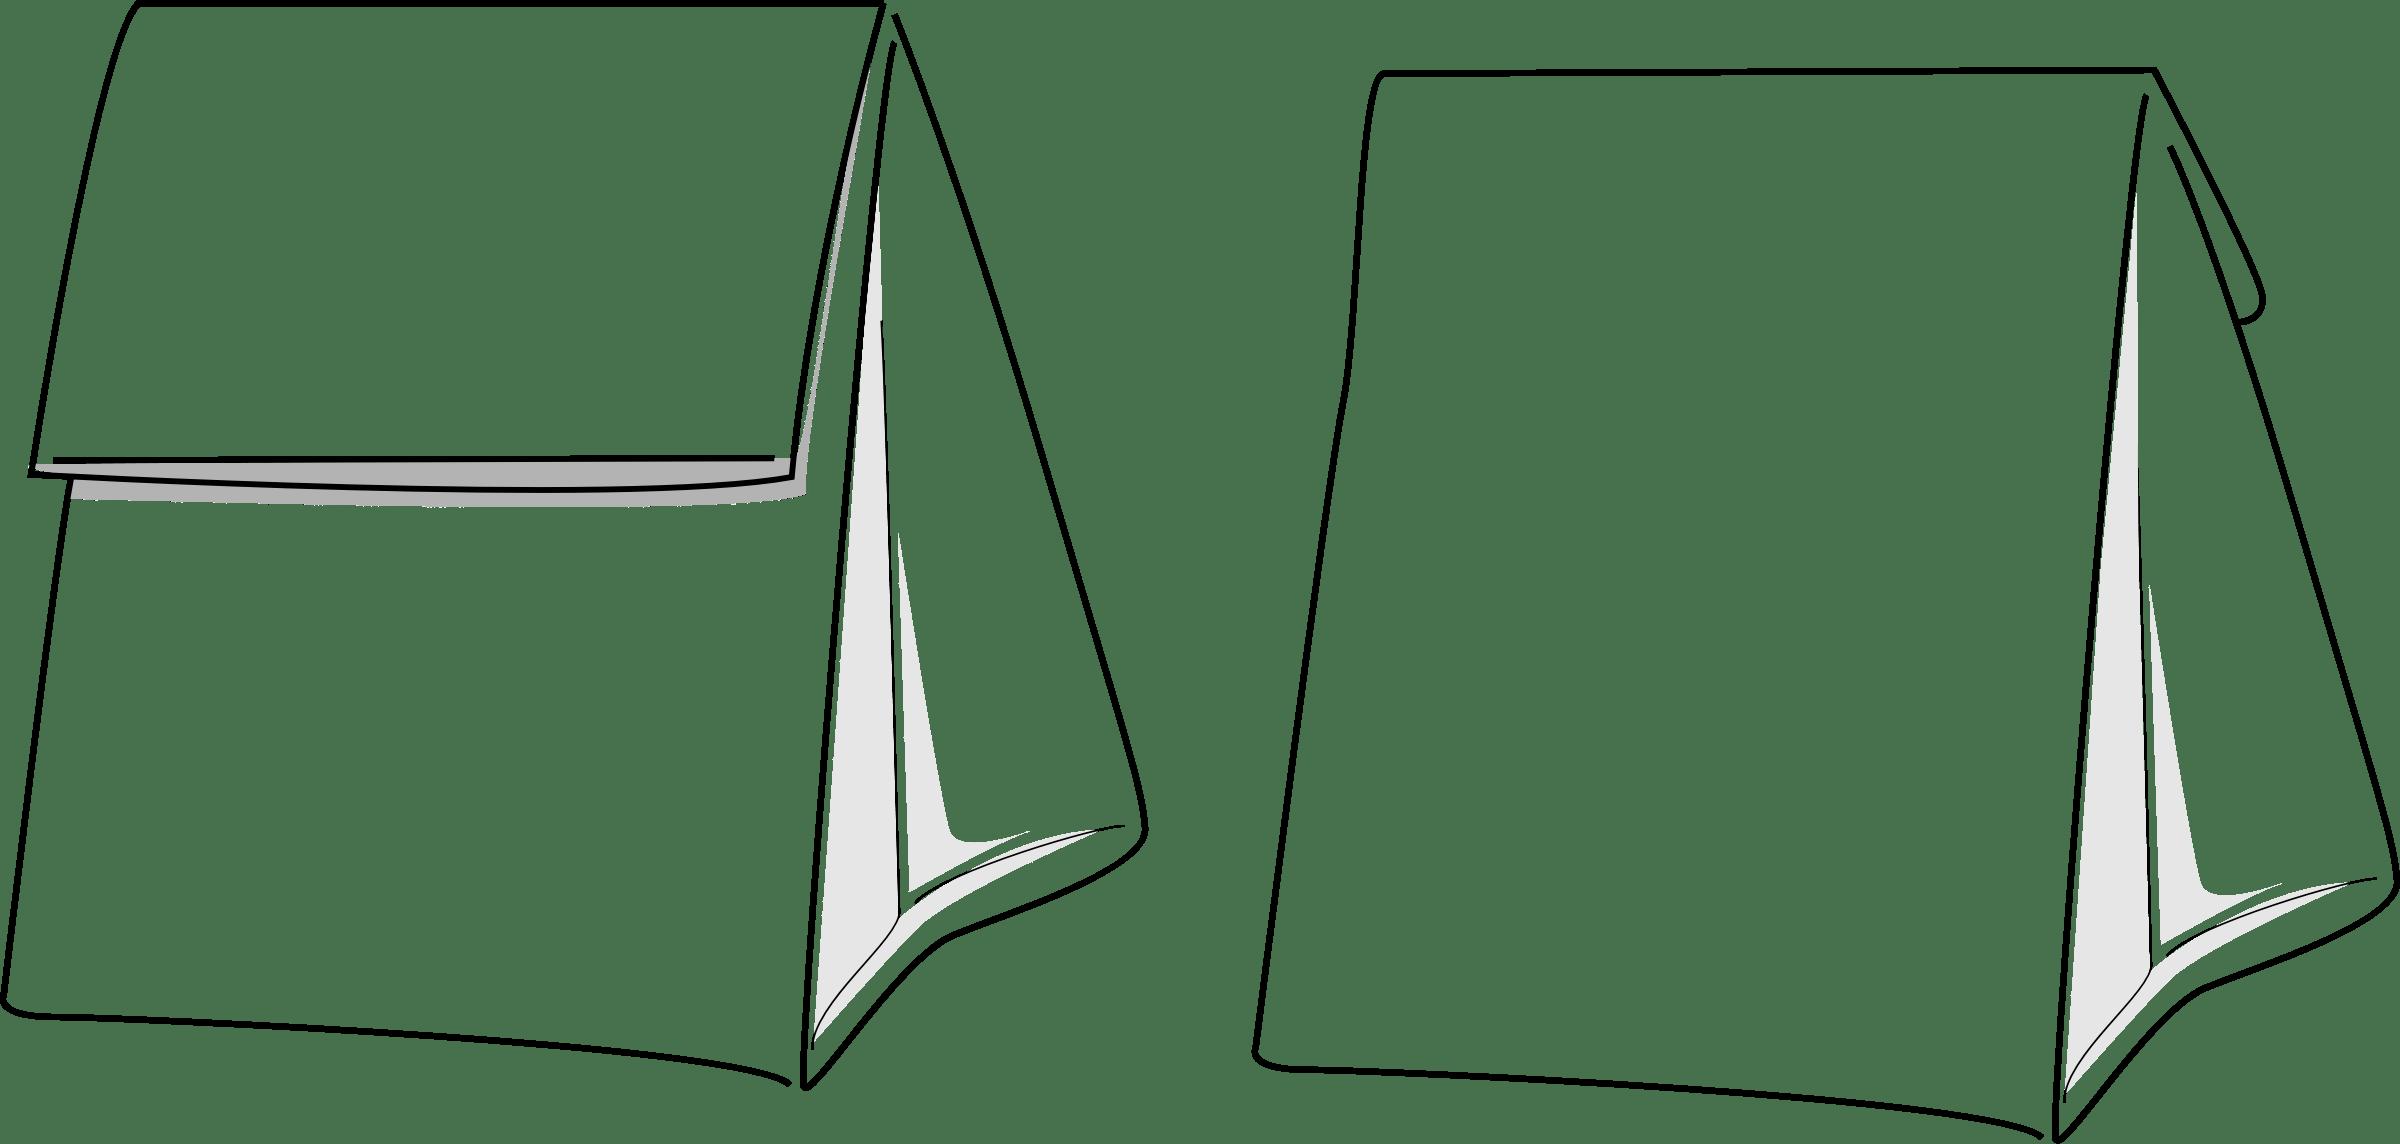 Lunchbox Clipart Paper Bag Lunchbox Paper Bag Transparent